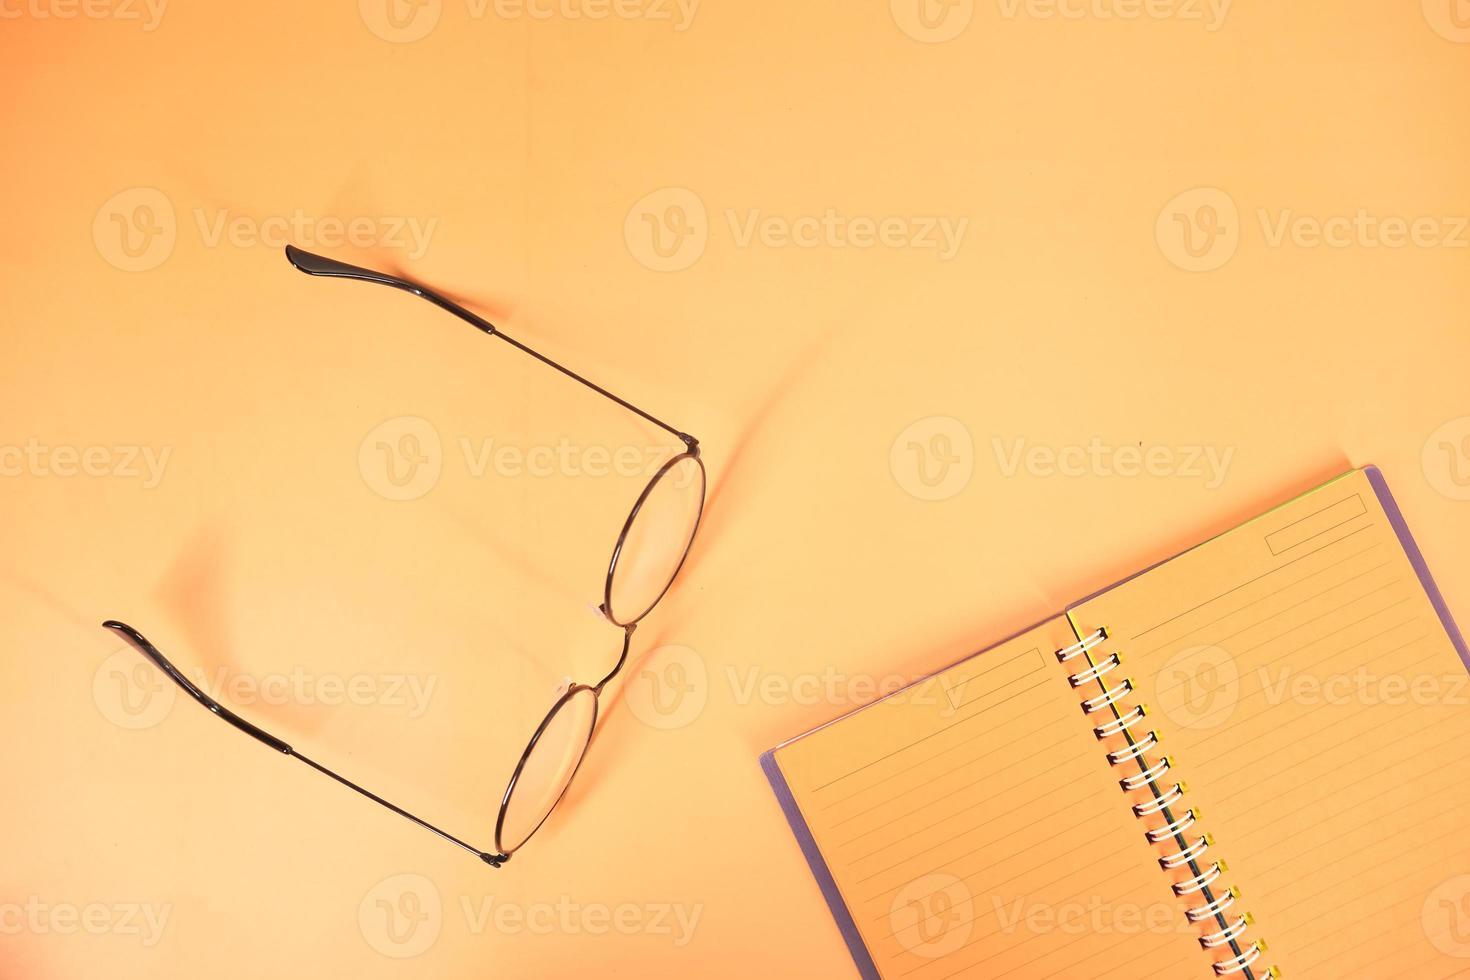 blocco note arancione su sfondo arancione foto